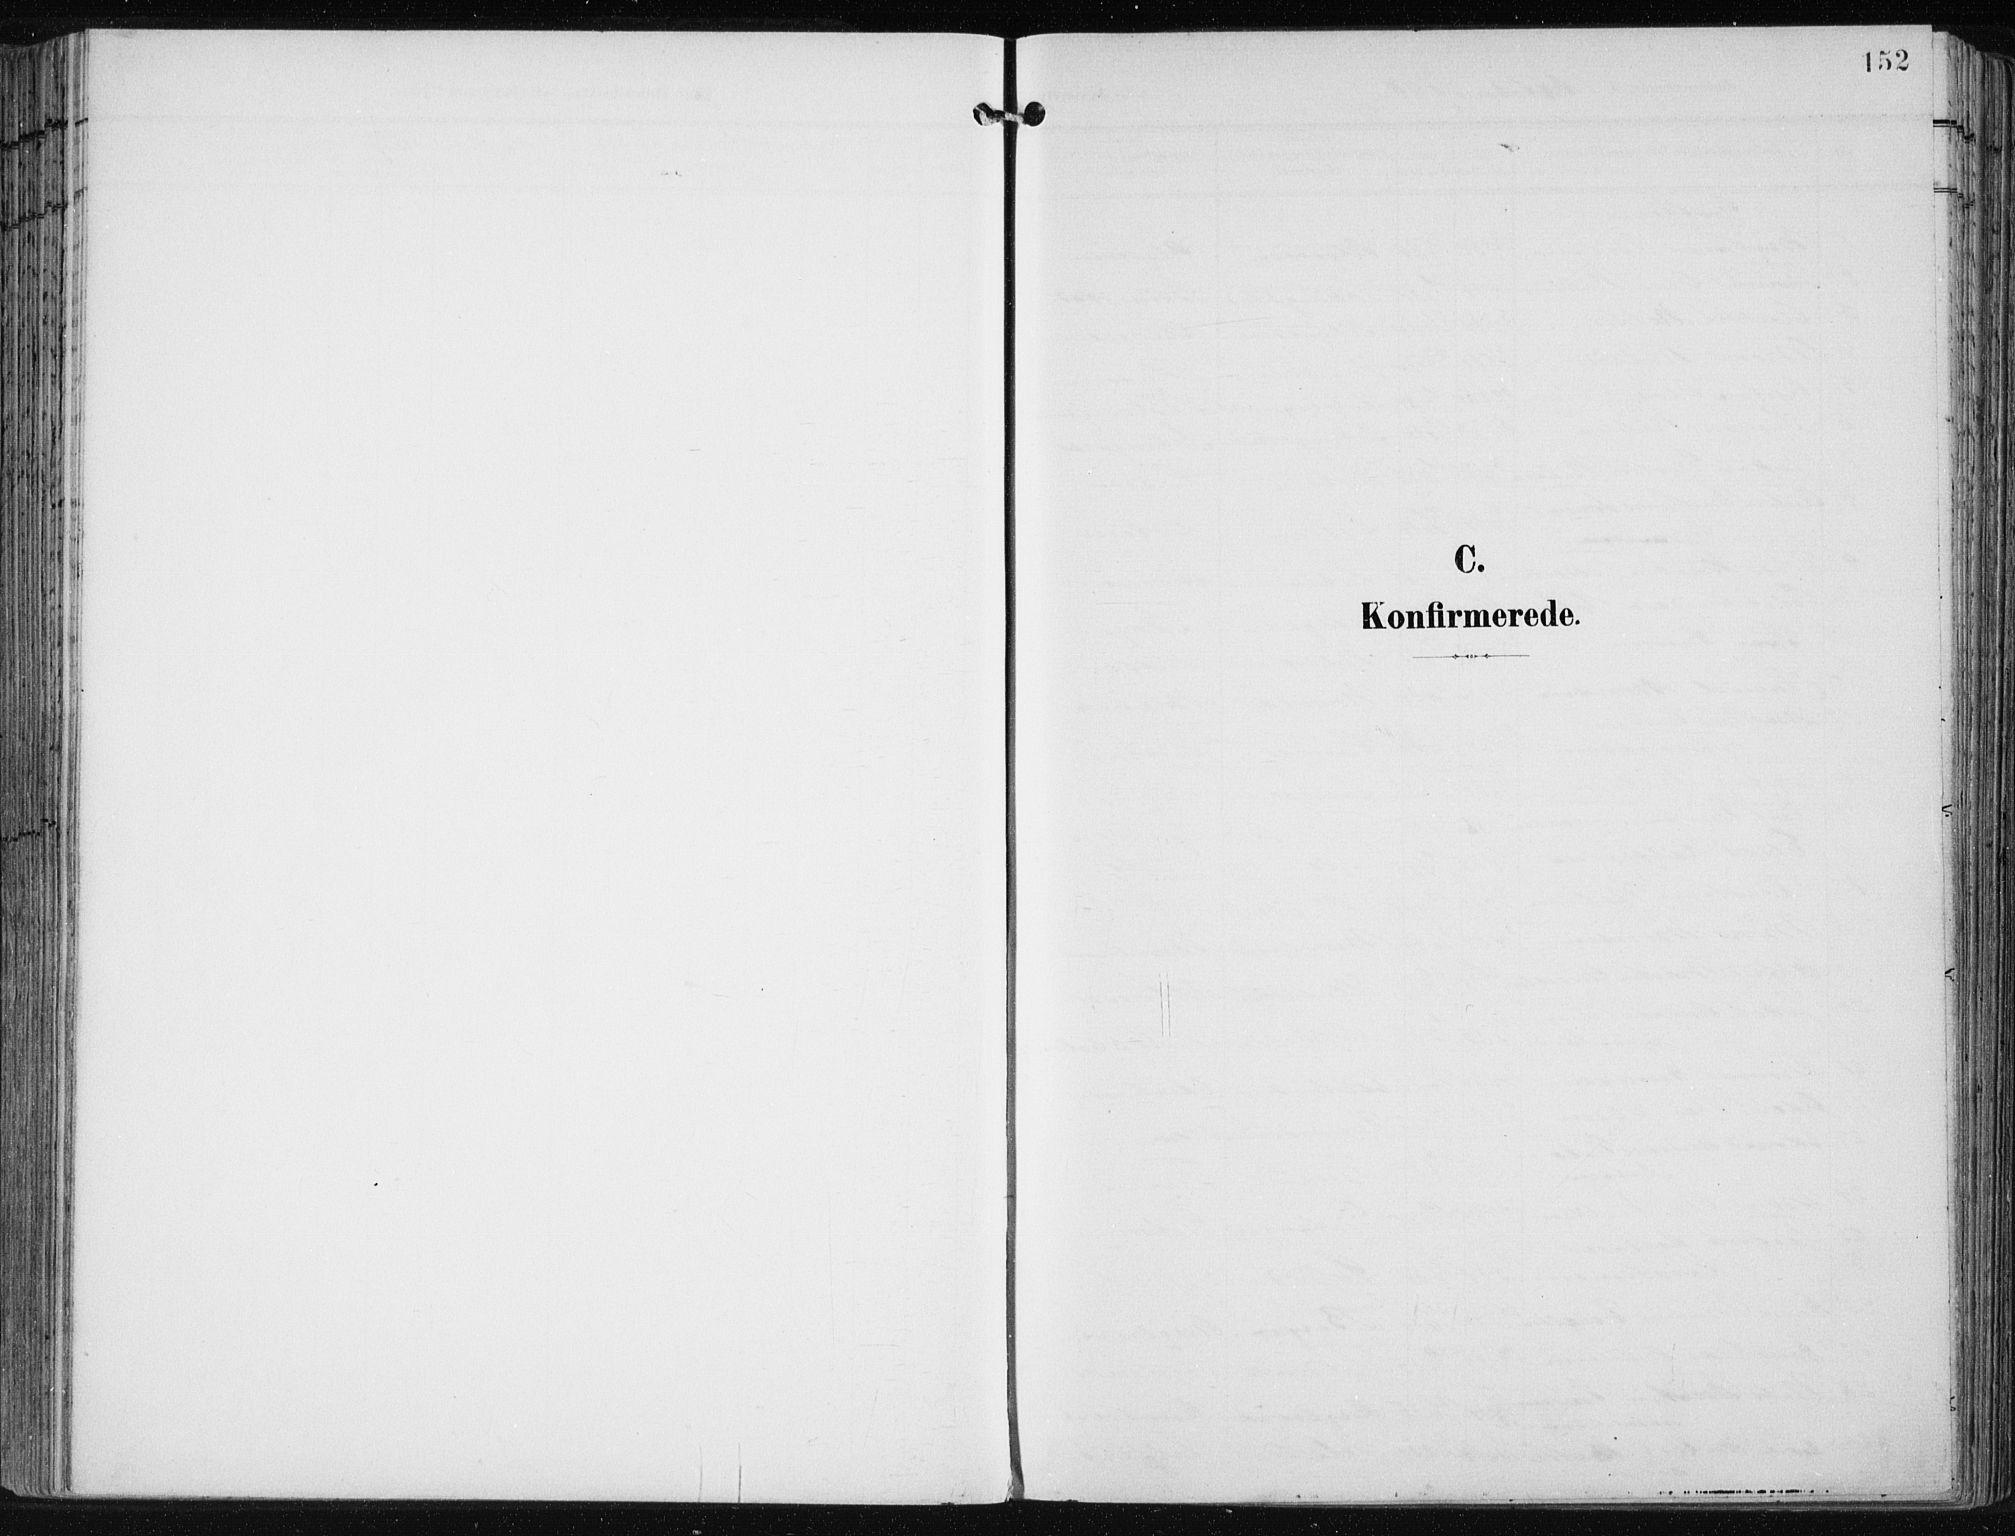 SAB, Fjell sokneprestembete, H/Haa: Parish register (official) no. A  9, 1899-1910, p. 152